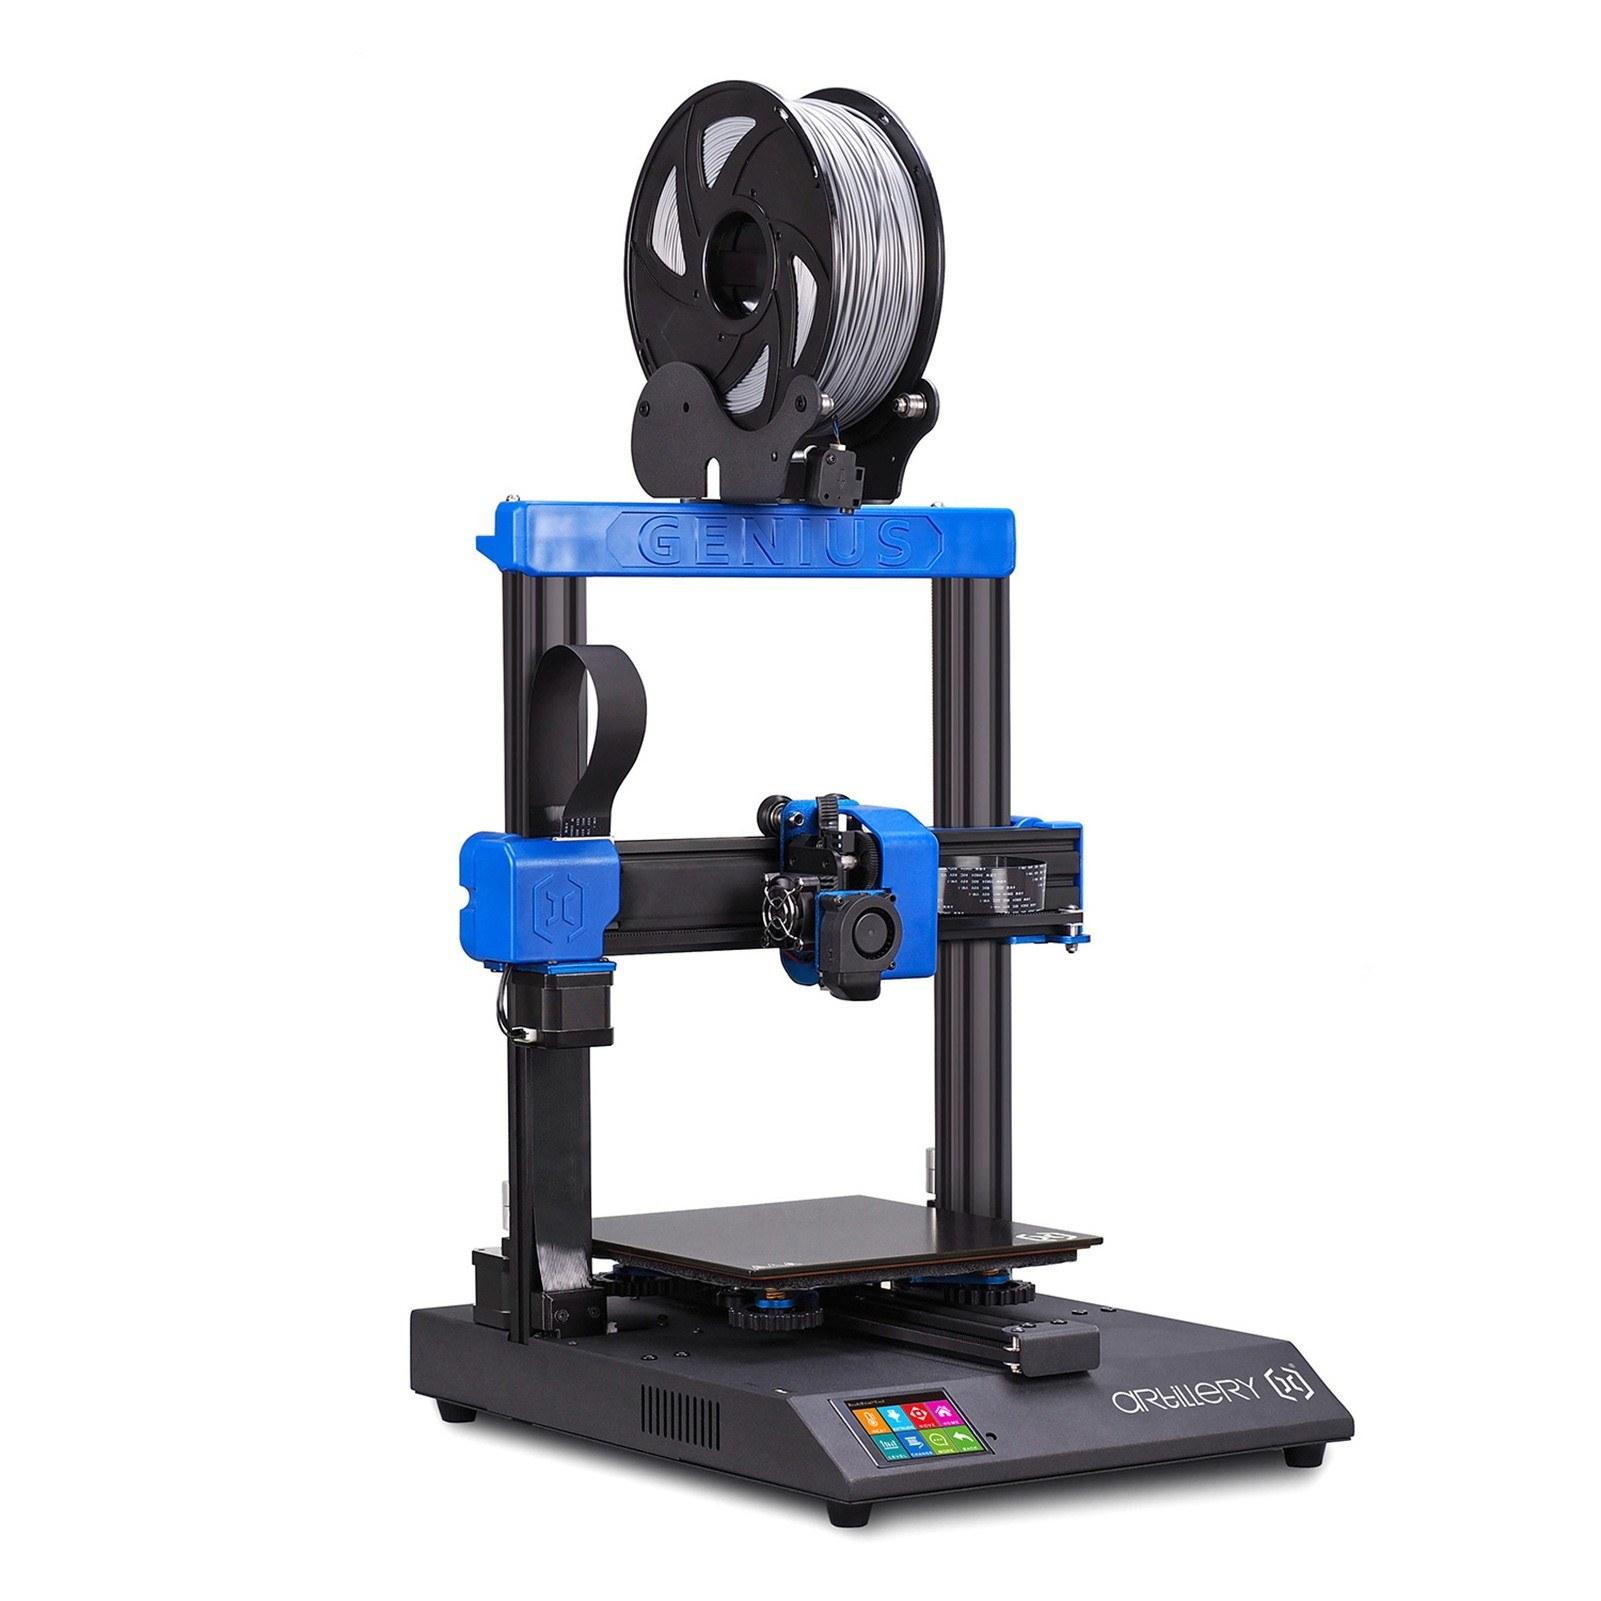 tomtop.com - $150 OFF Artillery Genius High Precision 3D Printer DIY Kit, Limited Offers $276